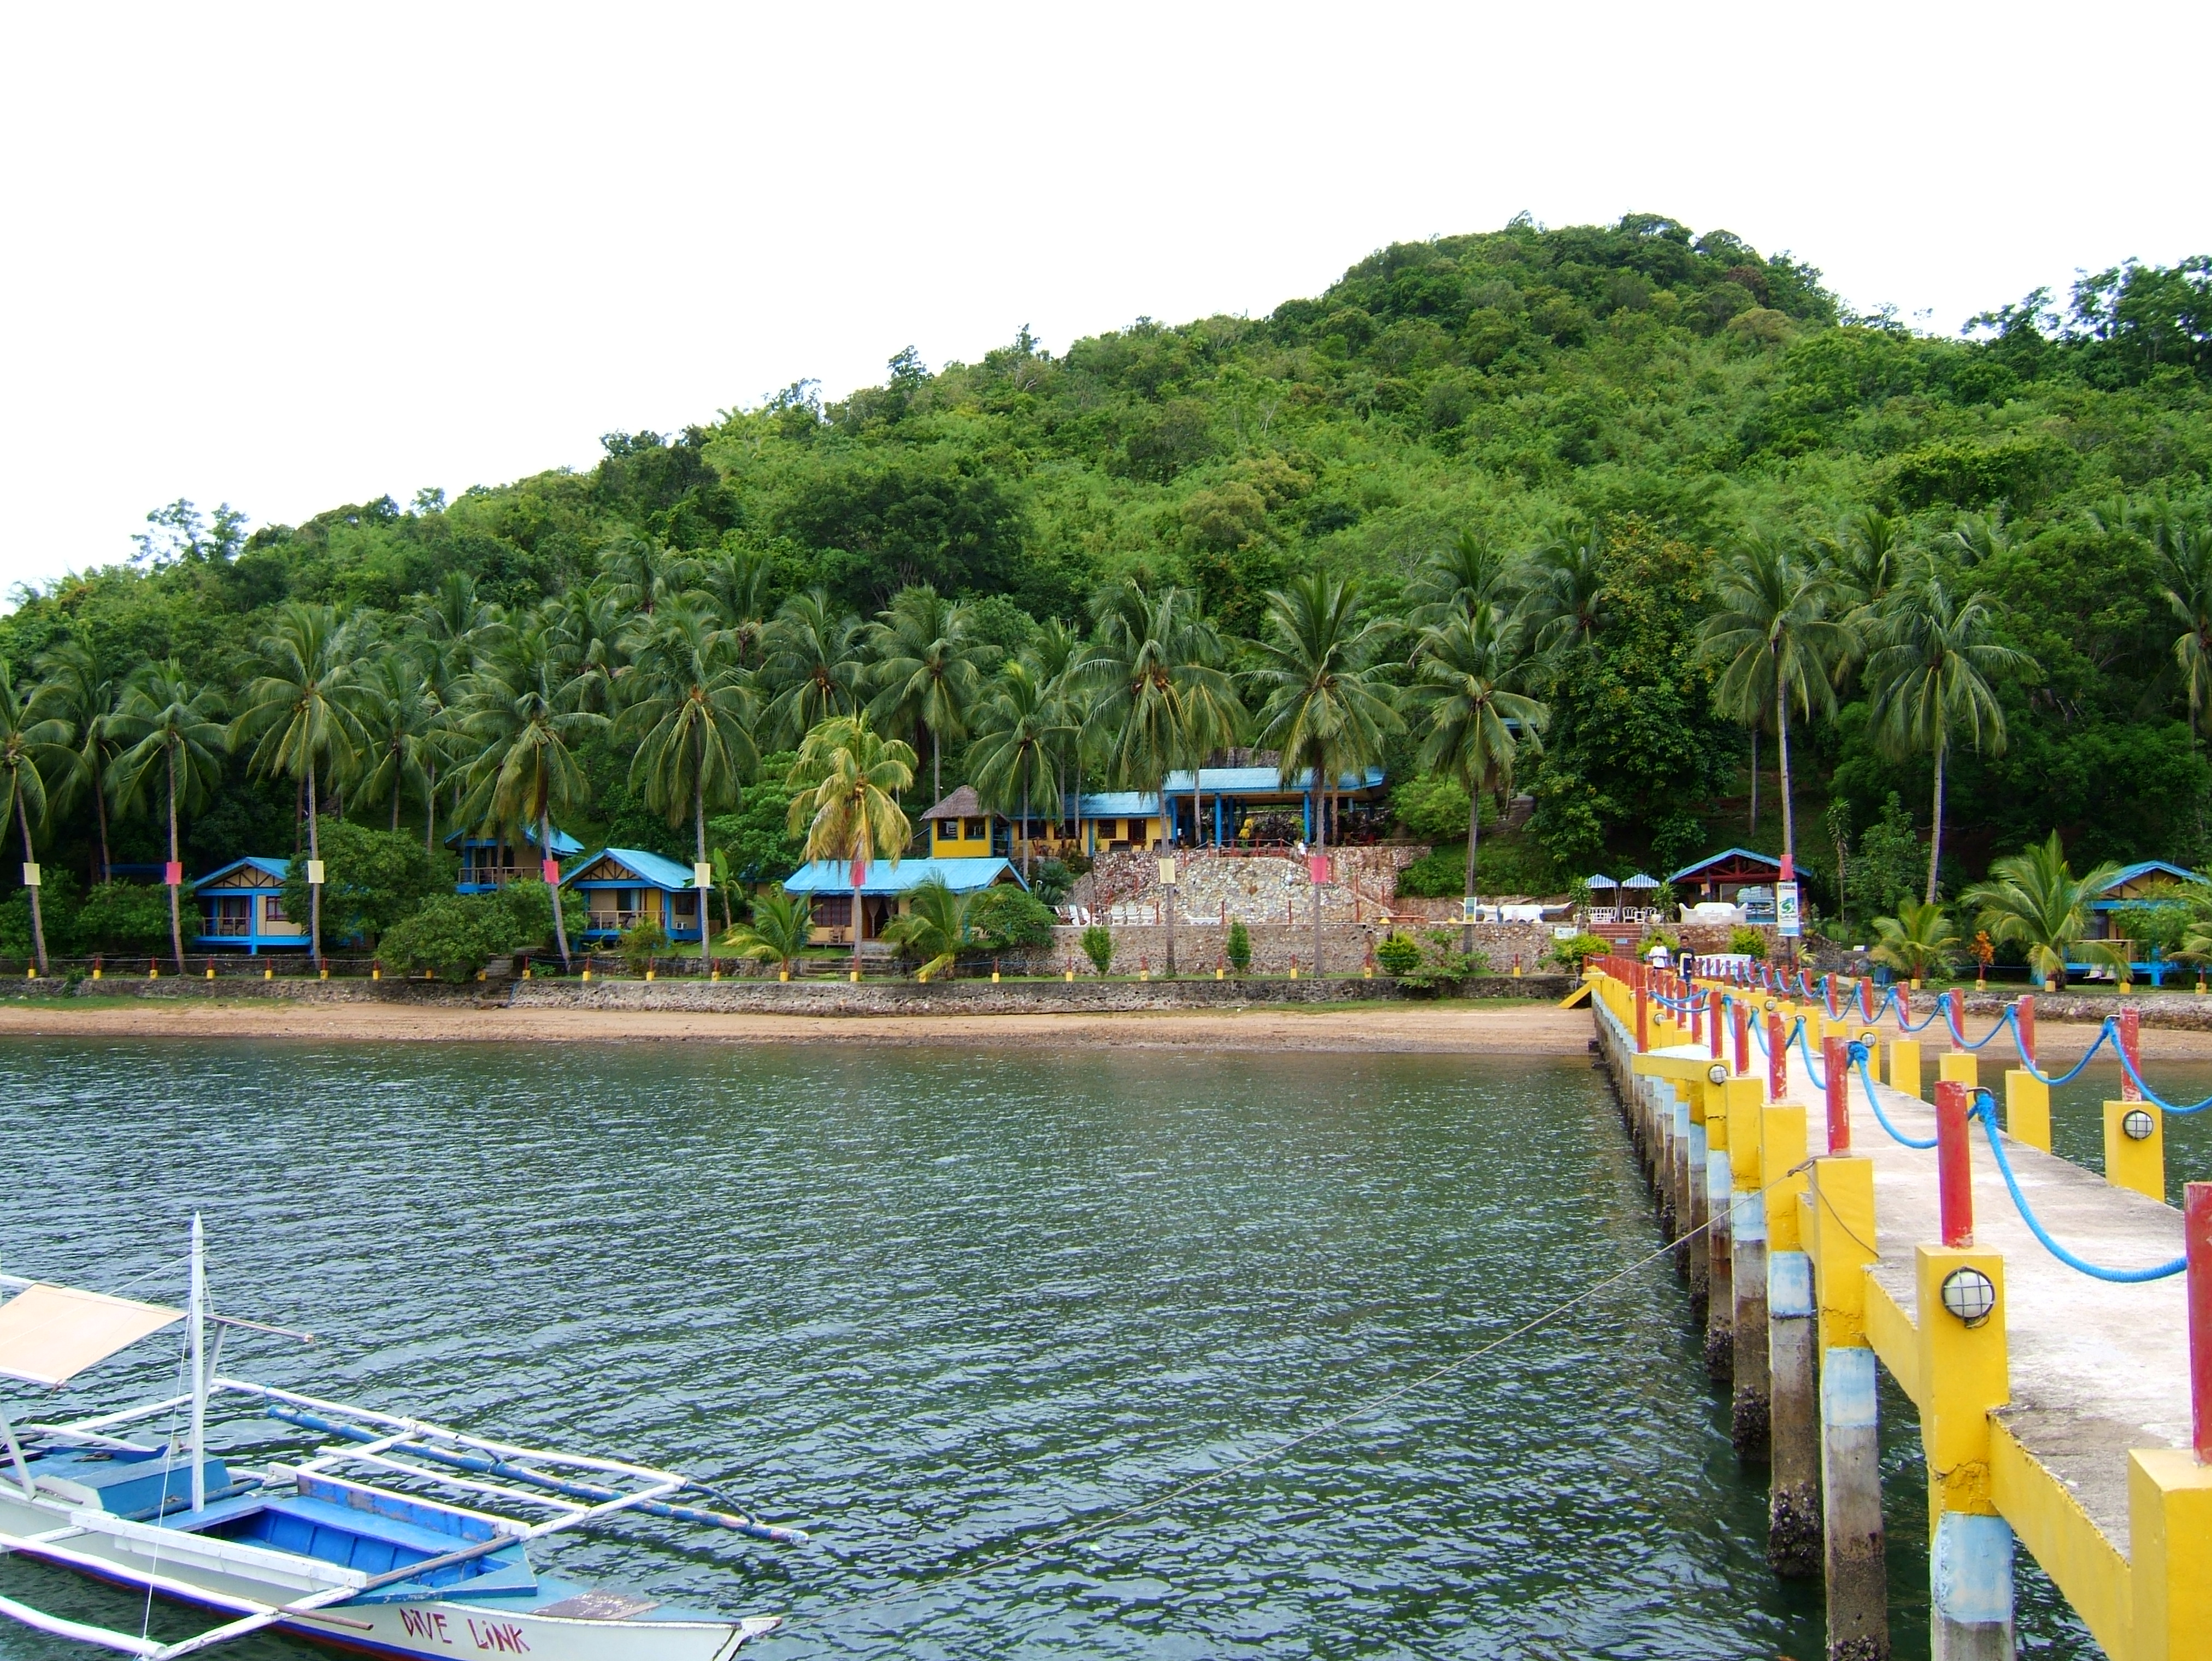 Philippines Palawan Islands CoronJuly 2005 03